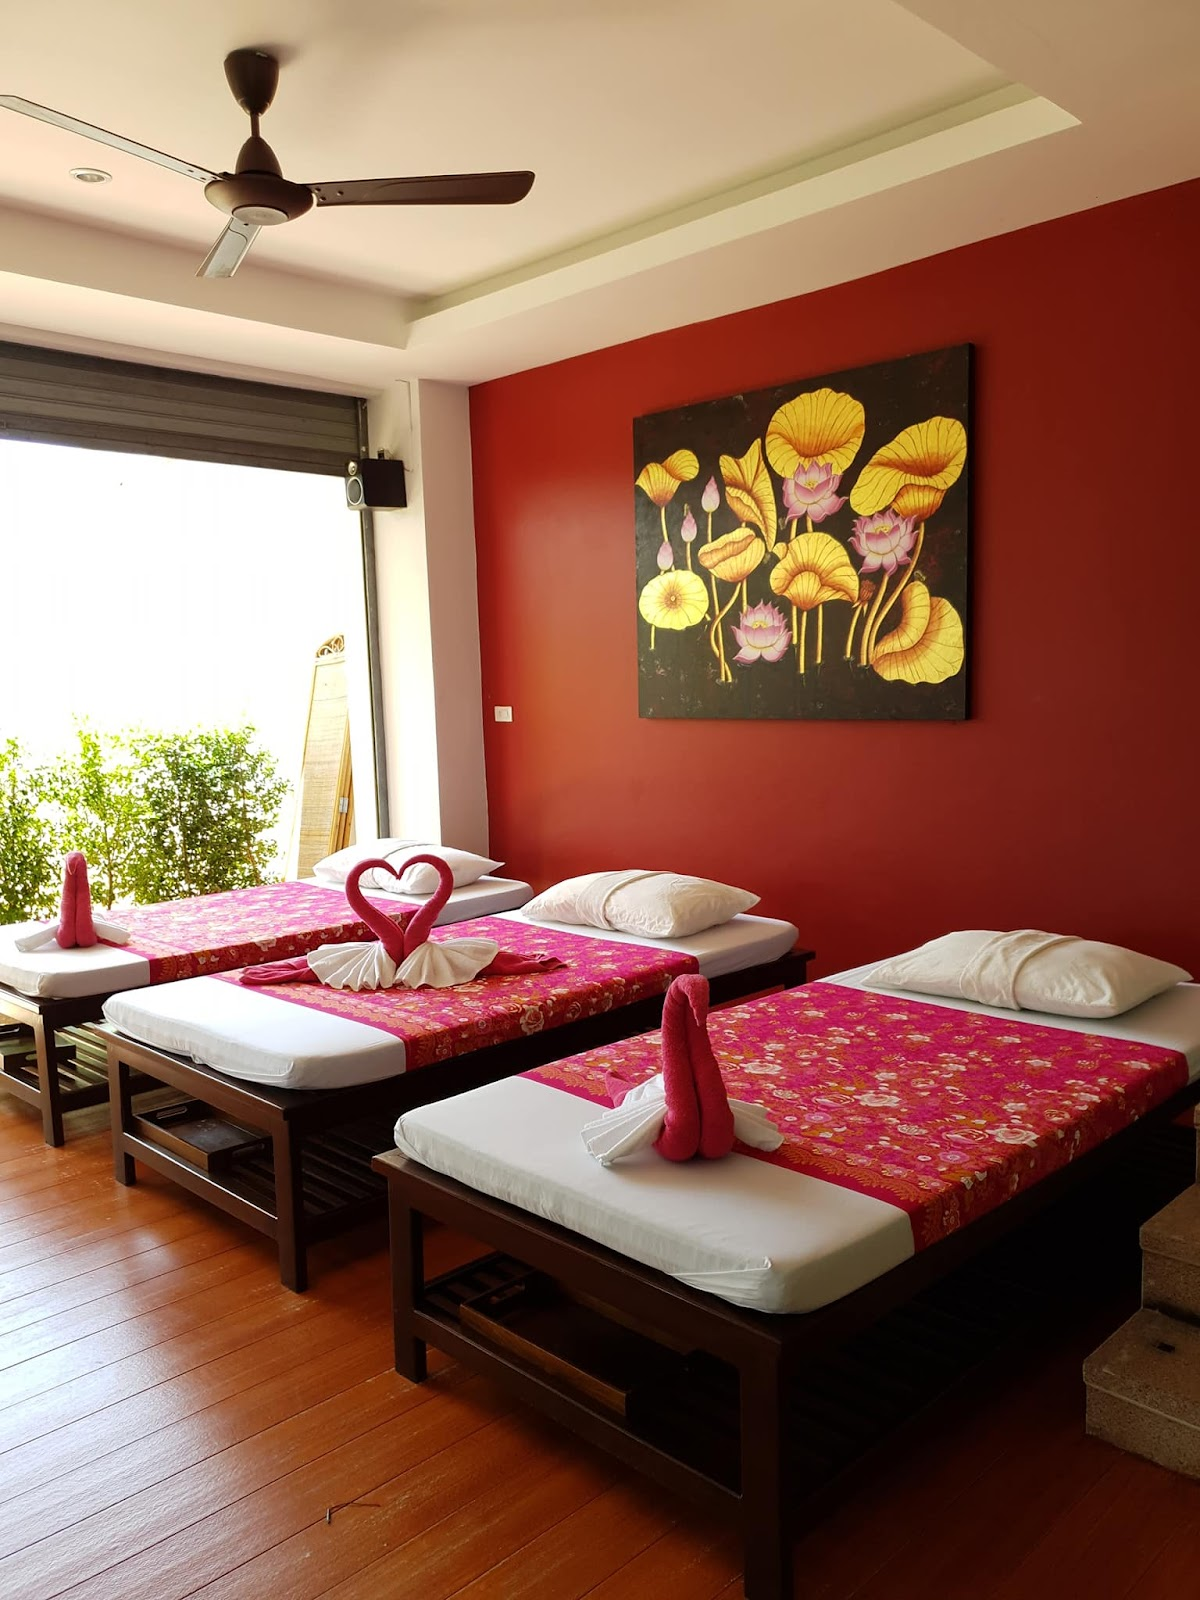 Massage beds of the Massage Corner.